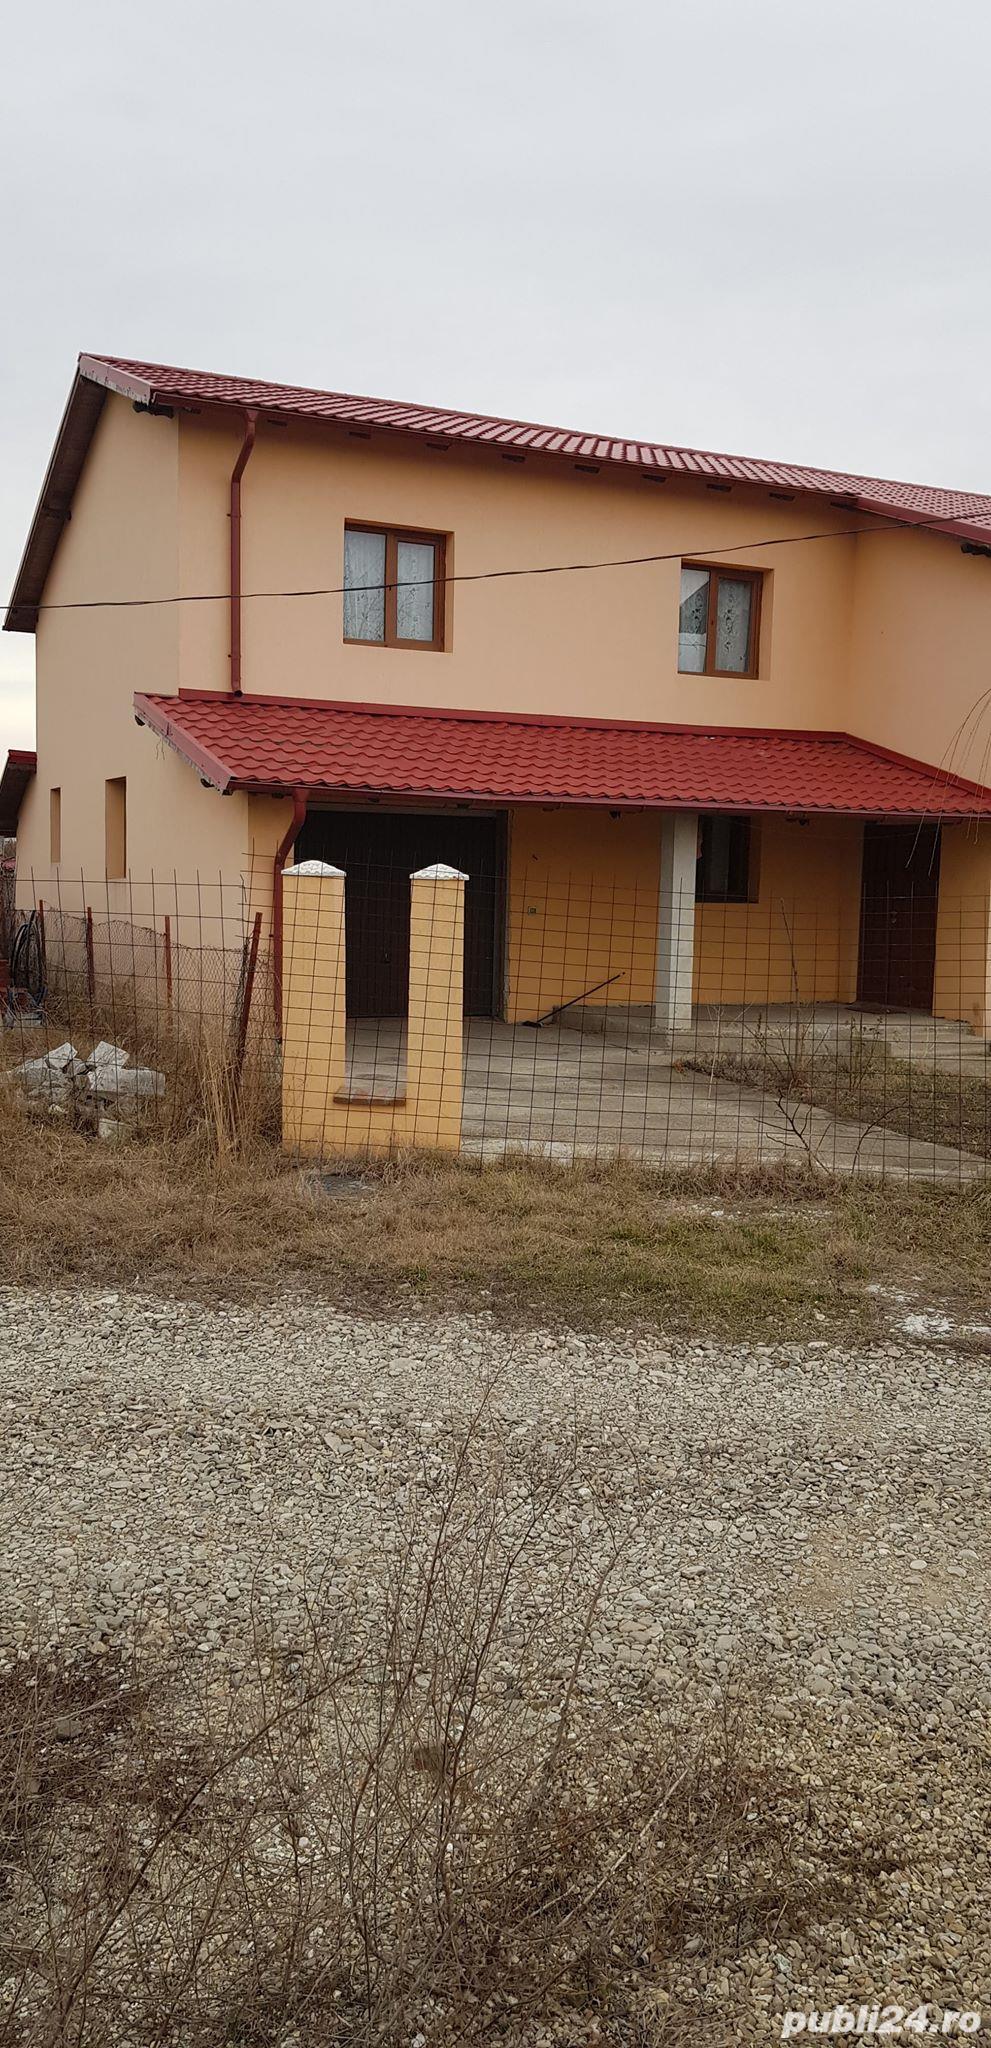 Casa/vila Cartier Spataru- schimb!!